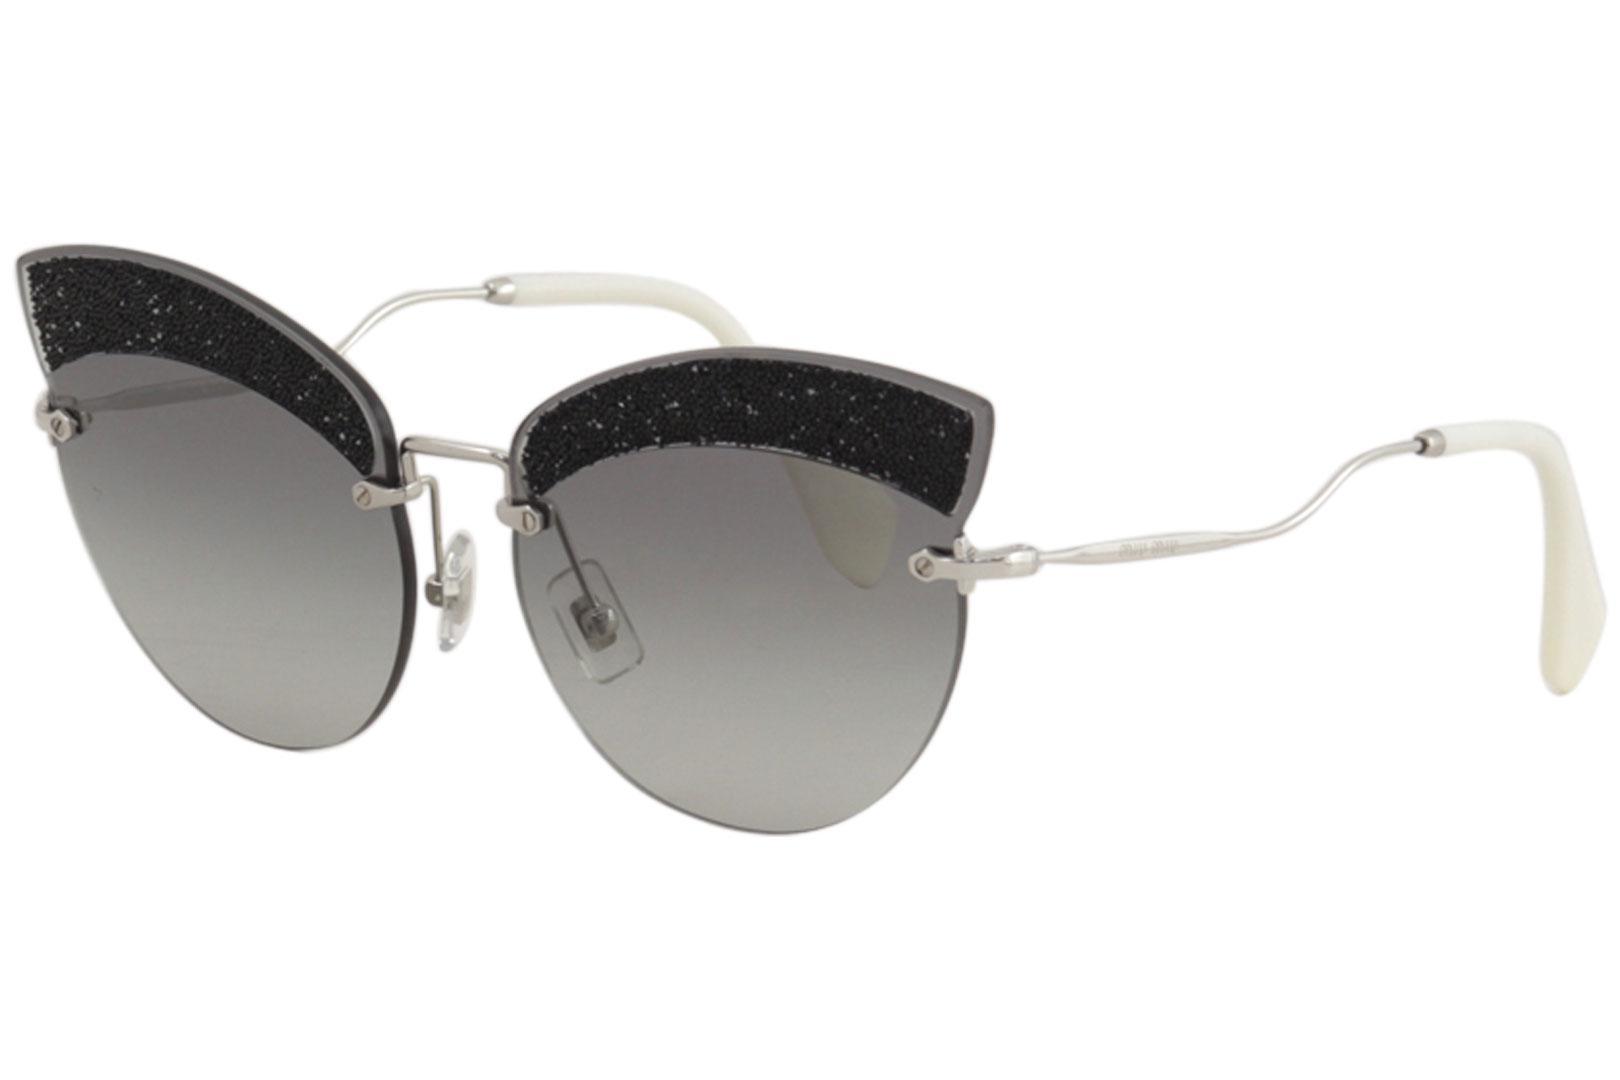 9d8dd7394a75 Details about Miu Miu Women's MU58TS MU/58/TS U983M1 Silver/Black Cateye  Sunglasses 65mm